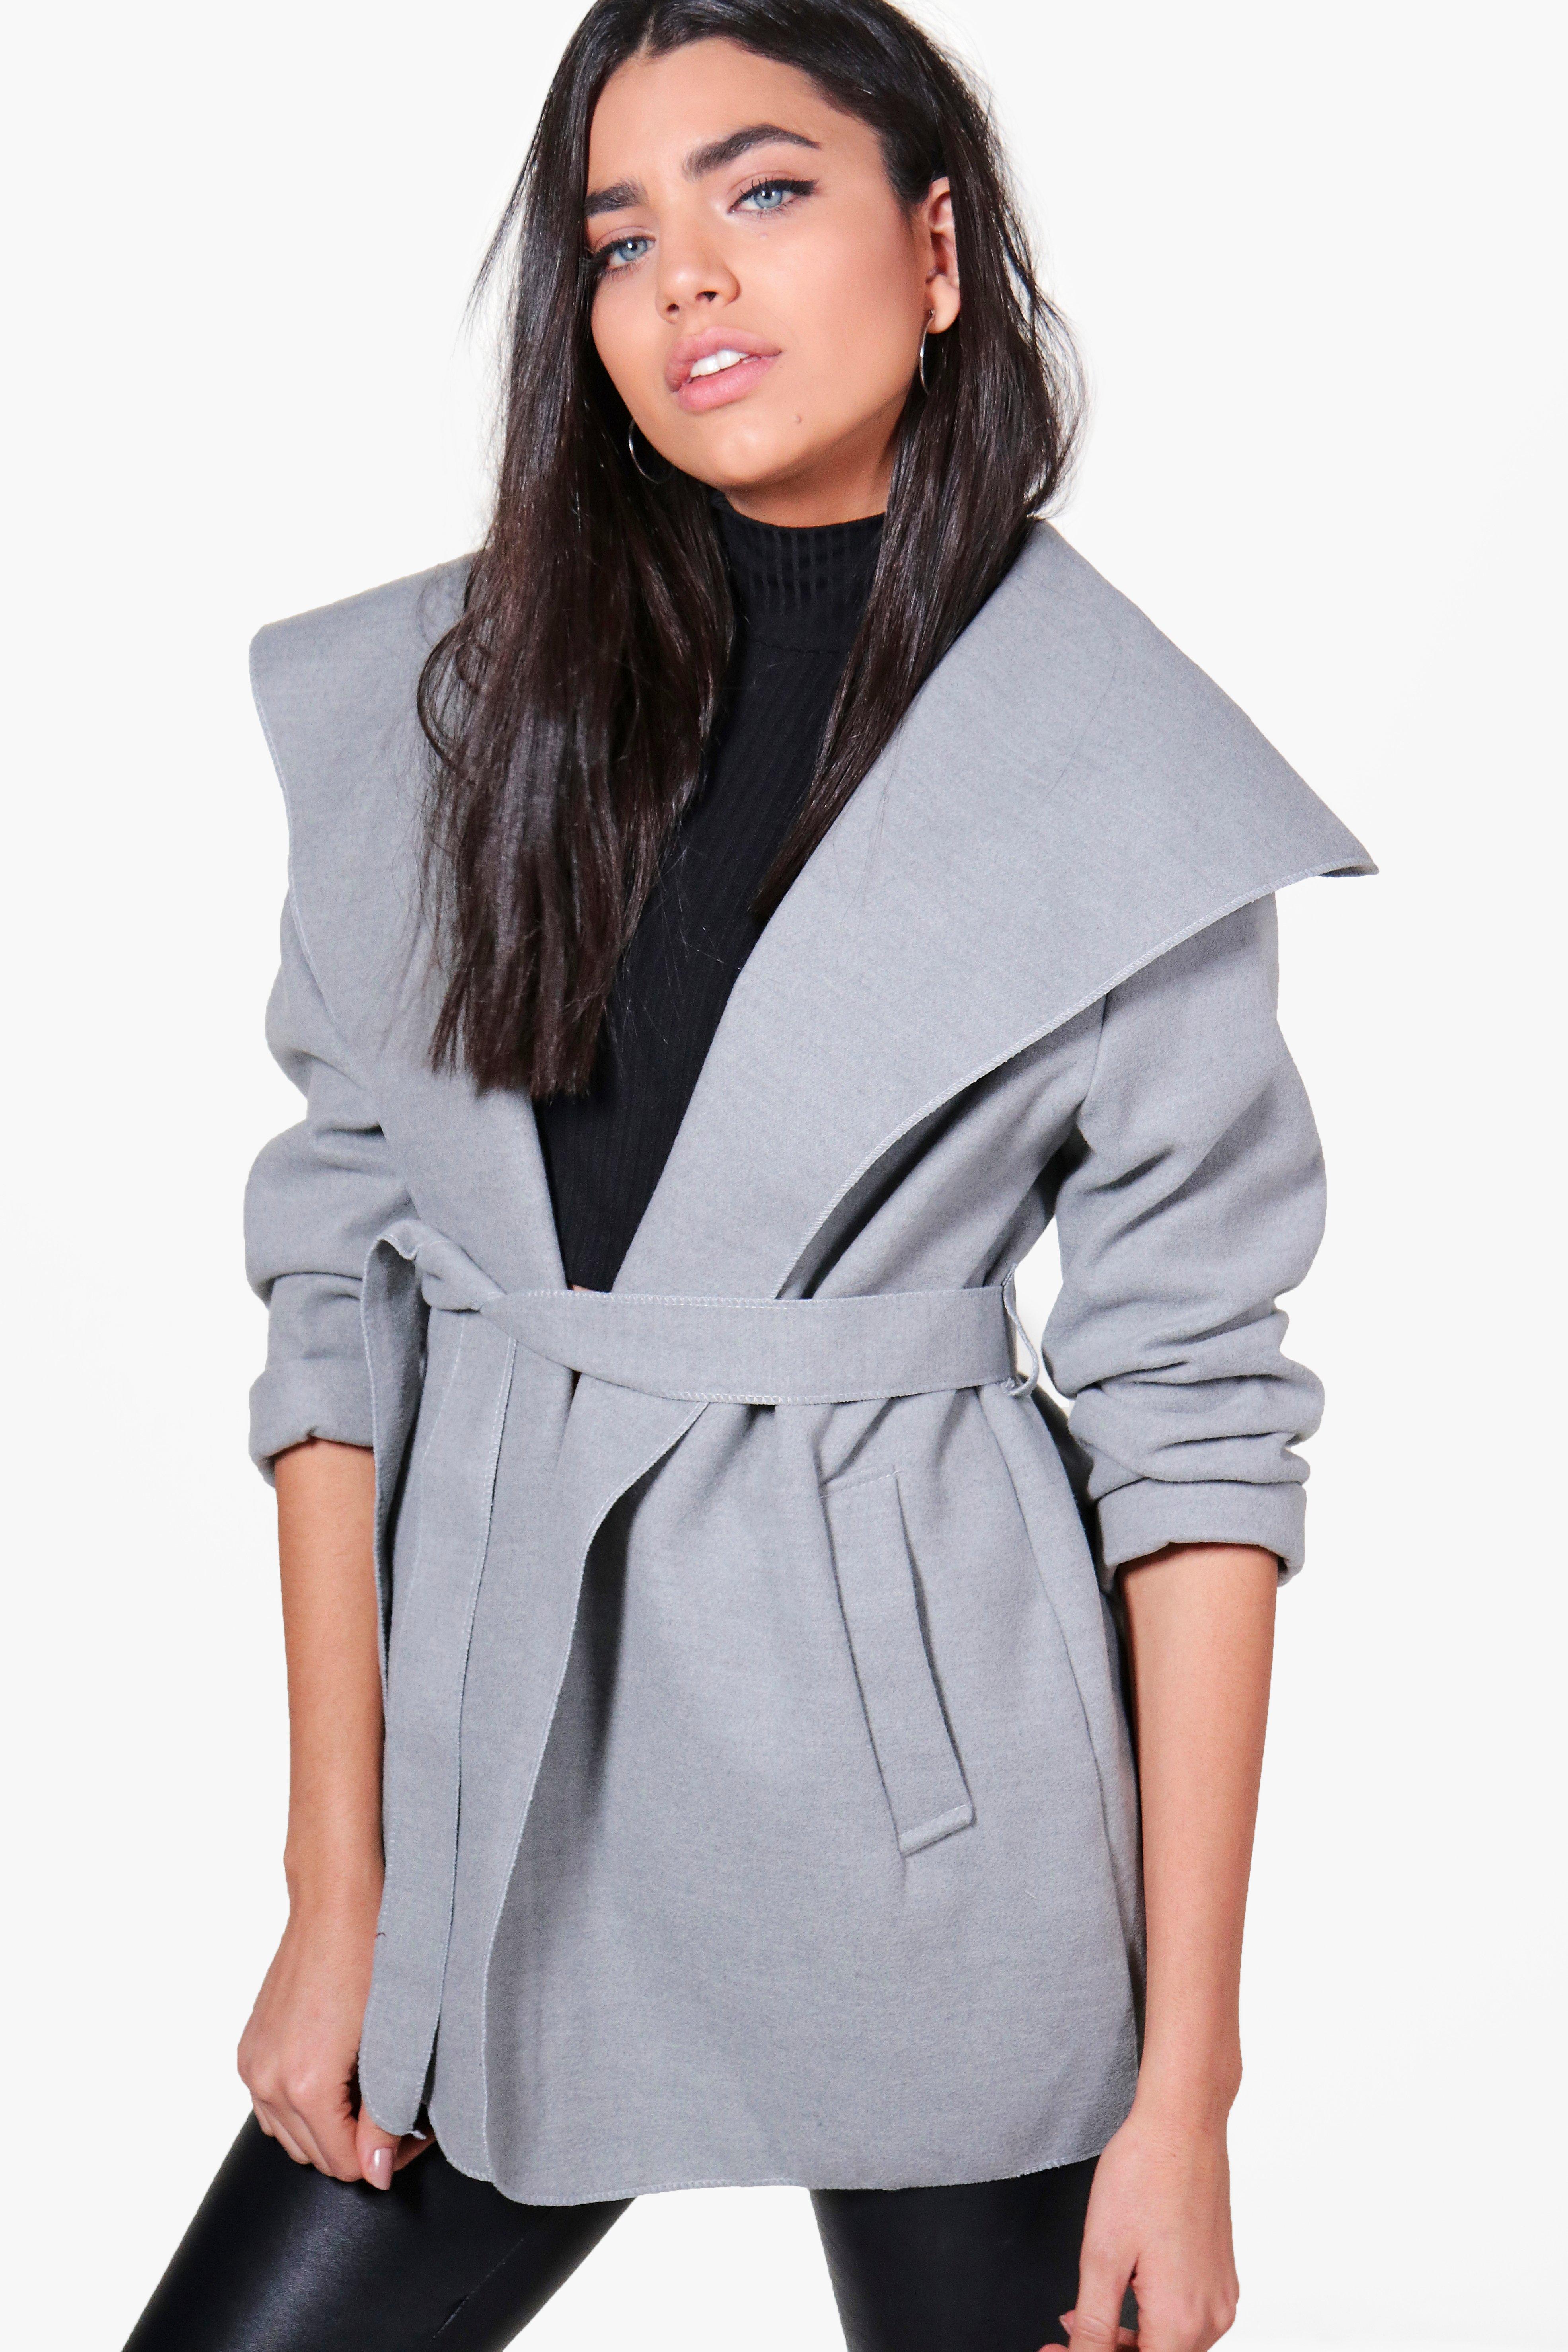 Waterfall Coat - grey